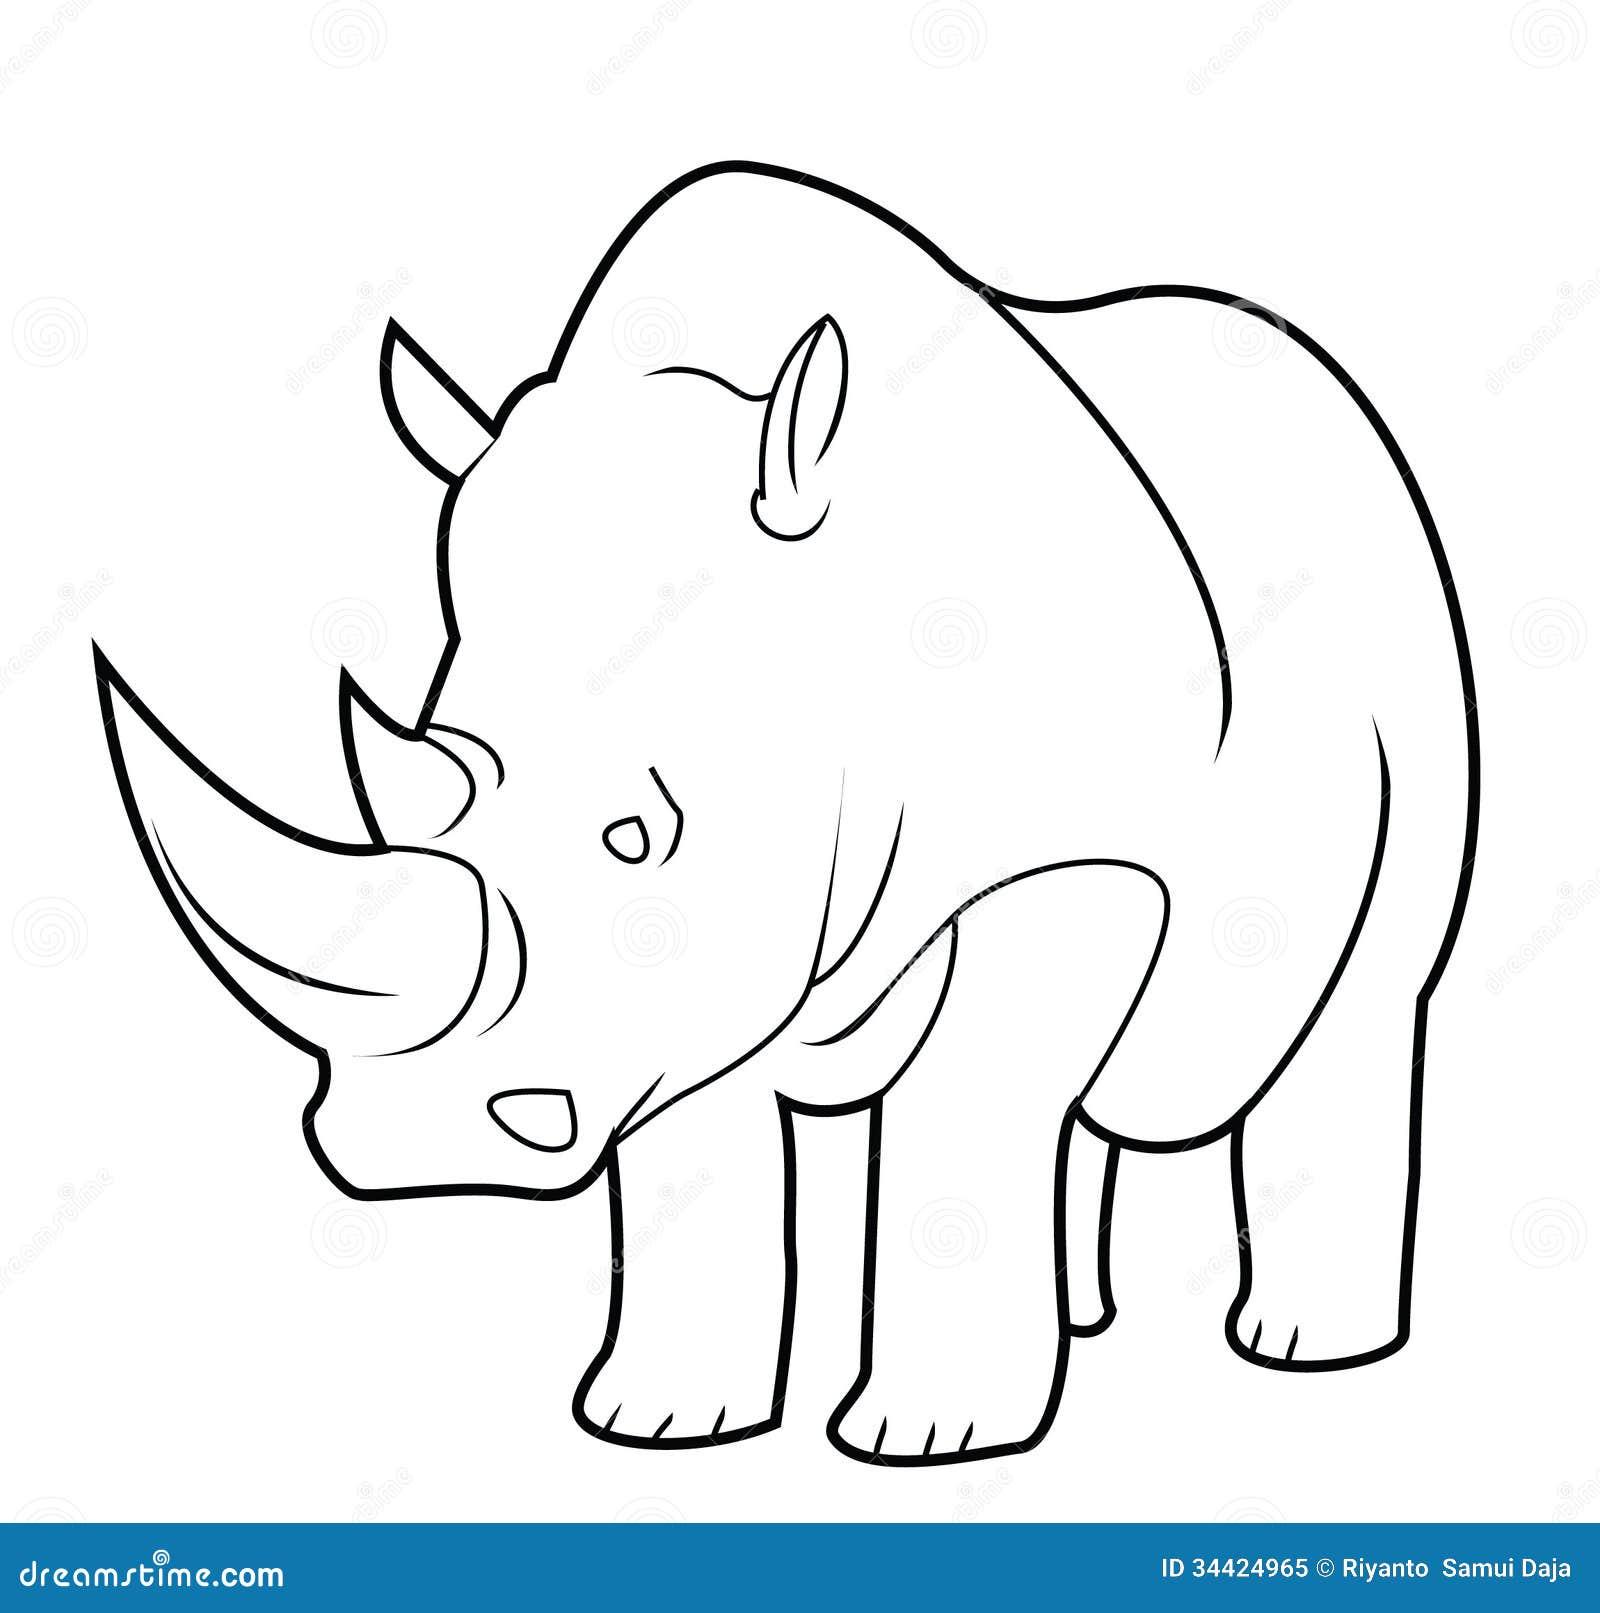 Safari jungle animals clip art and safari animals - Rhino Royalty Free Stock Photo Image 34424965